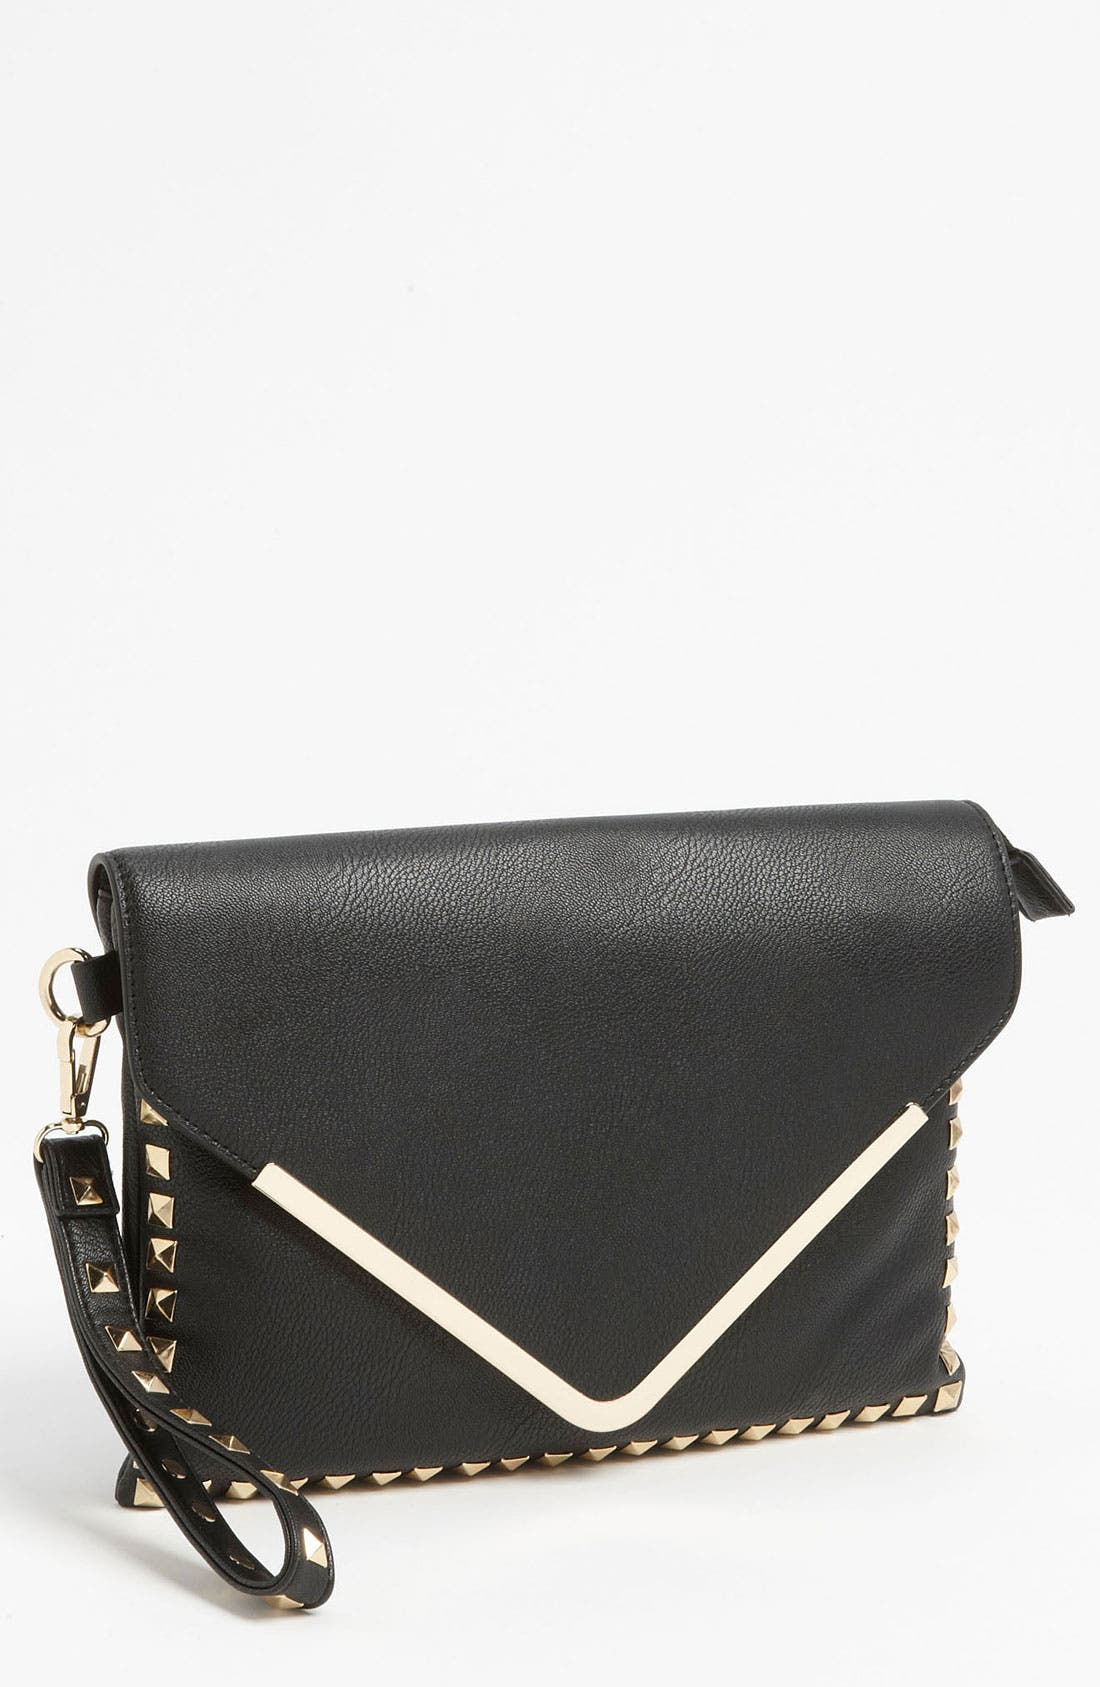 Alternate Image 1 Selected - High Fashion Handbags Studded Envelope Clutch